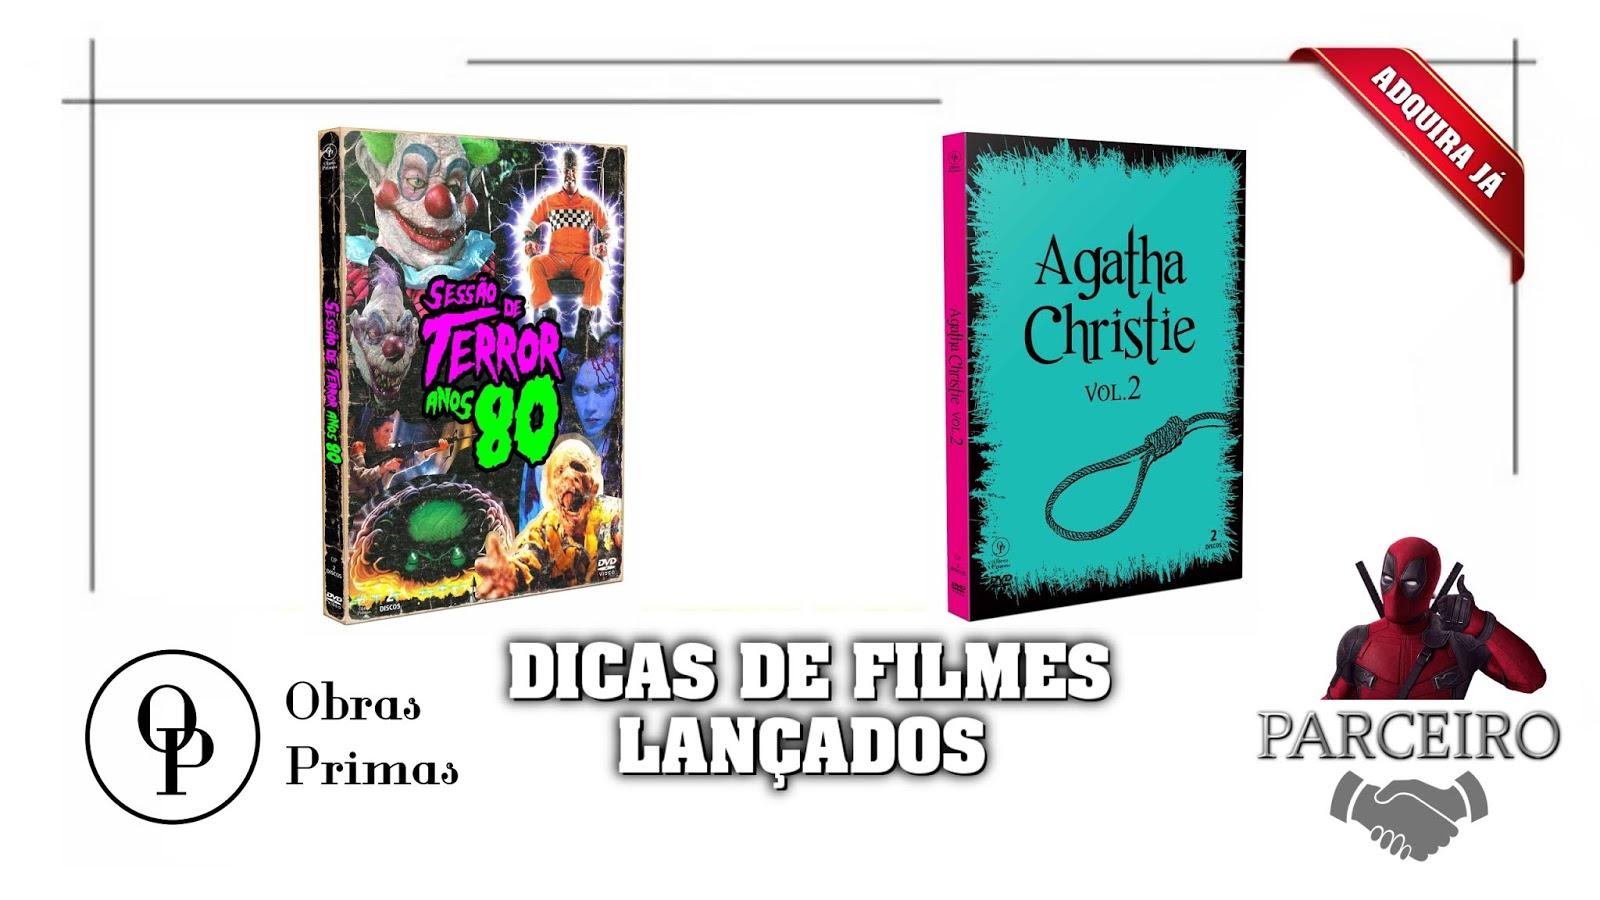 obras-primas-do-cinema-fev-2020